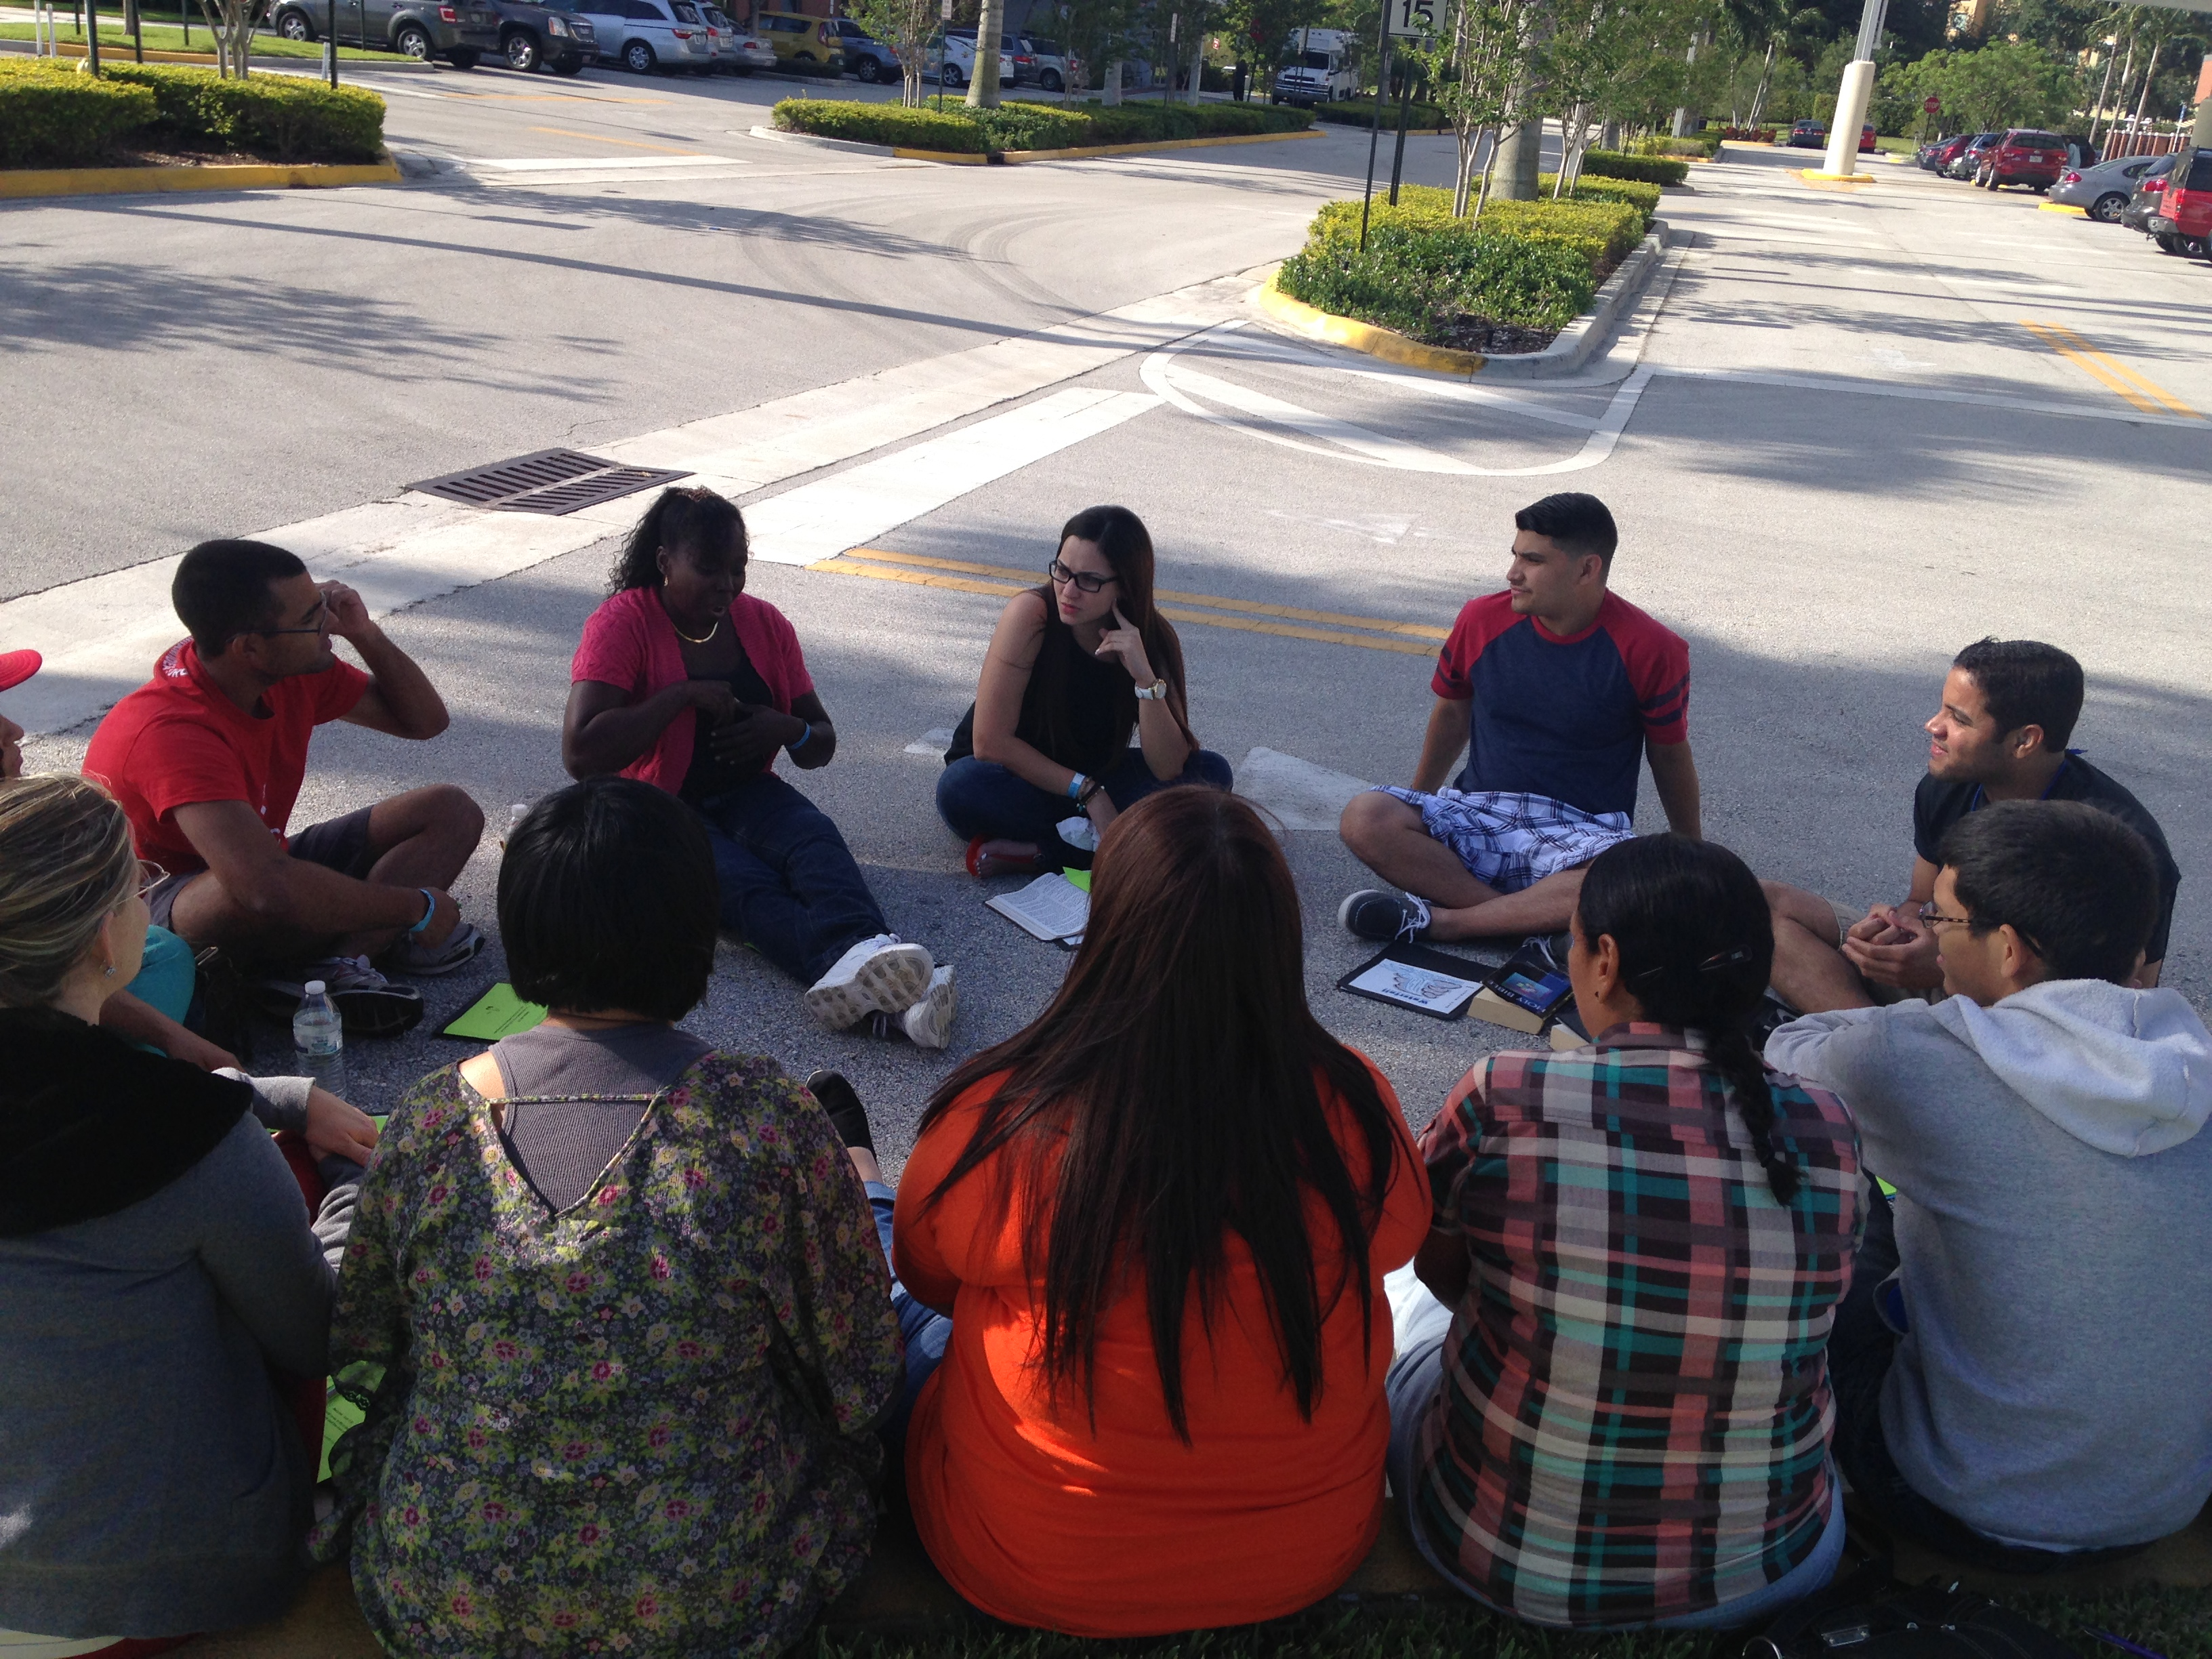 BIBLE STUDY GROUP AND PRAY TIME